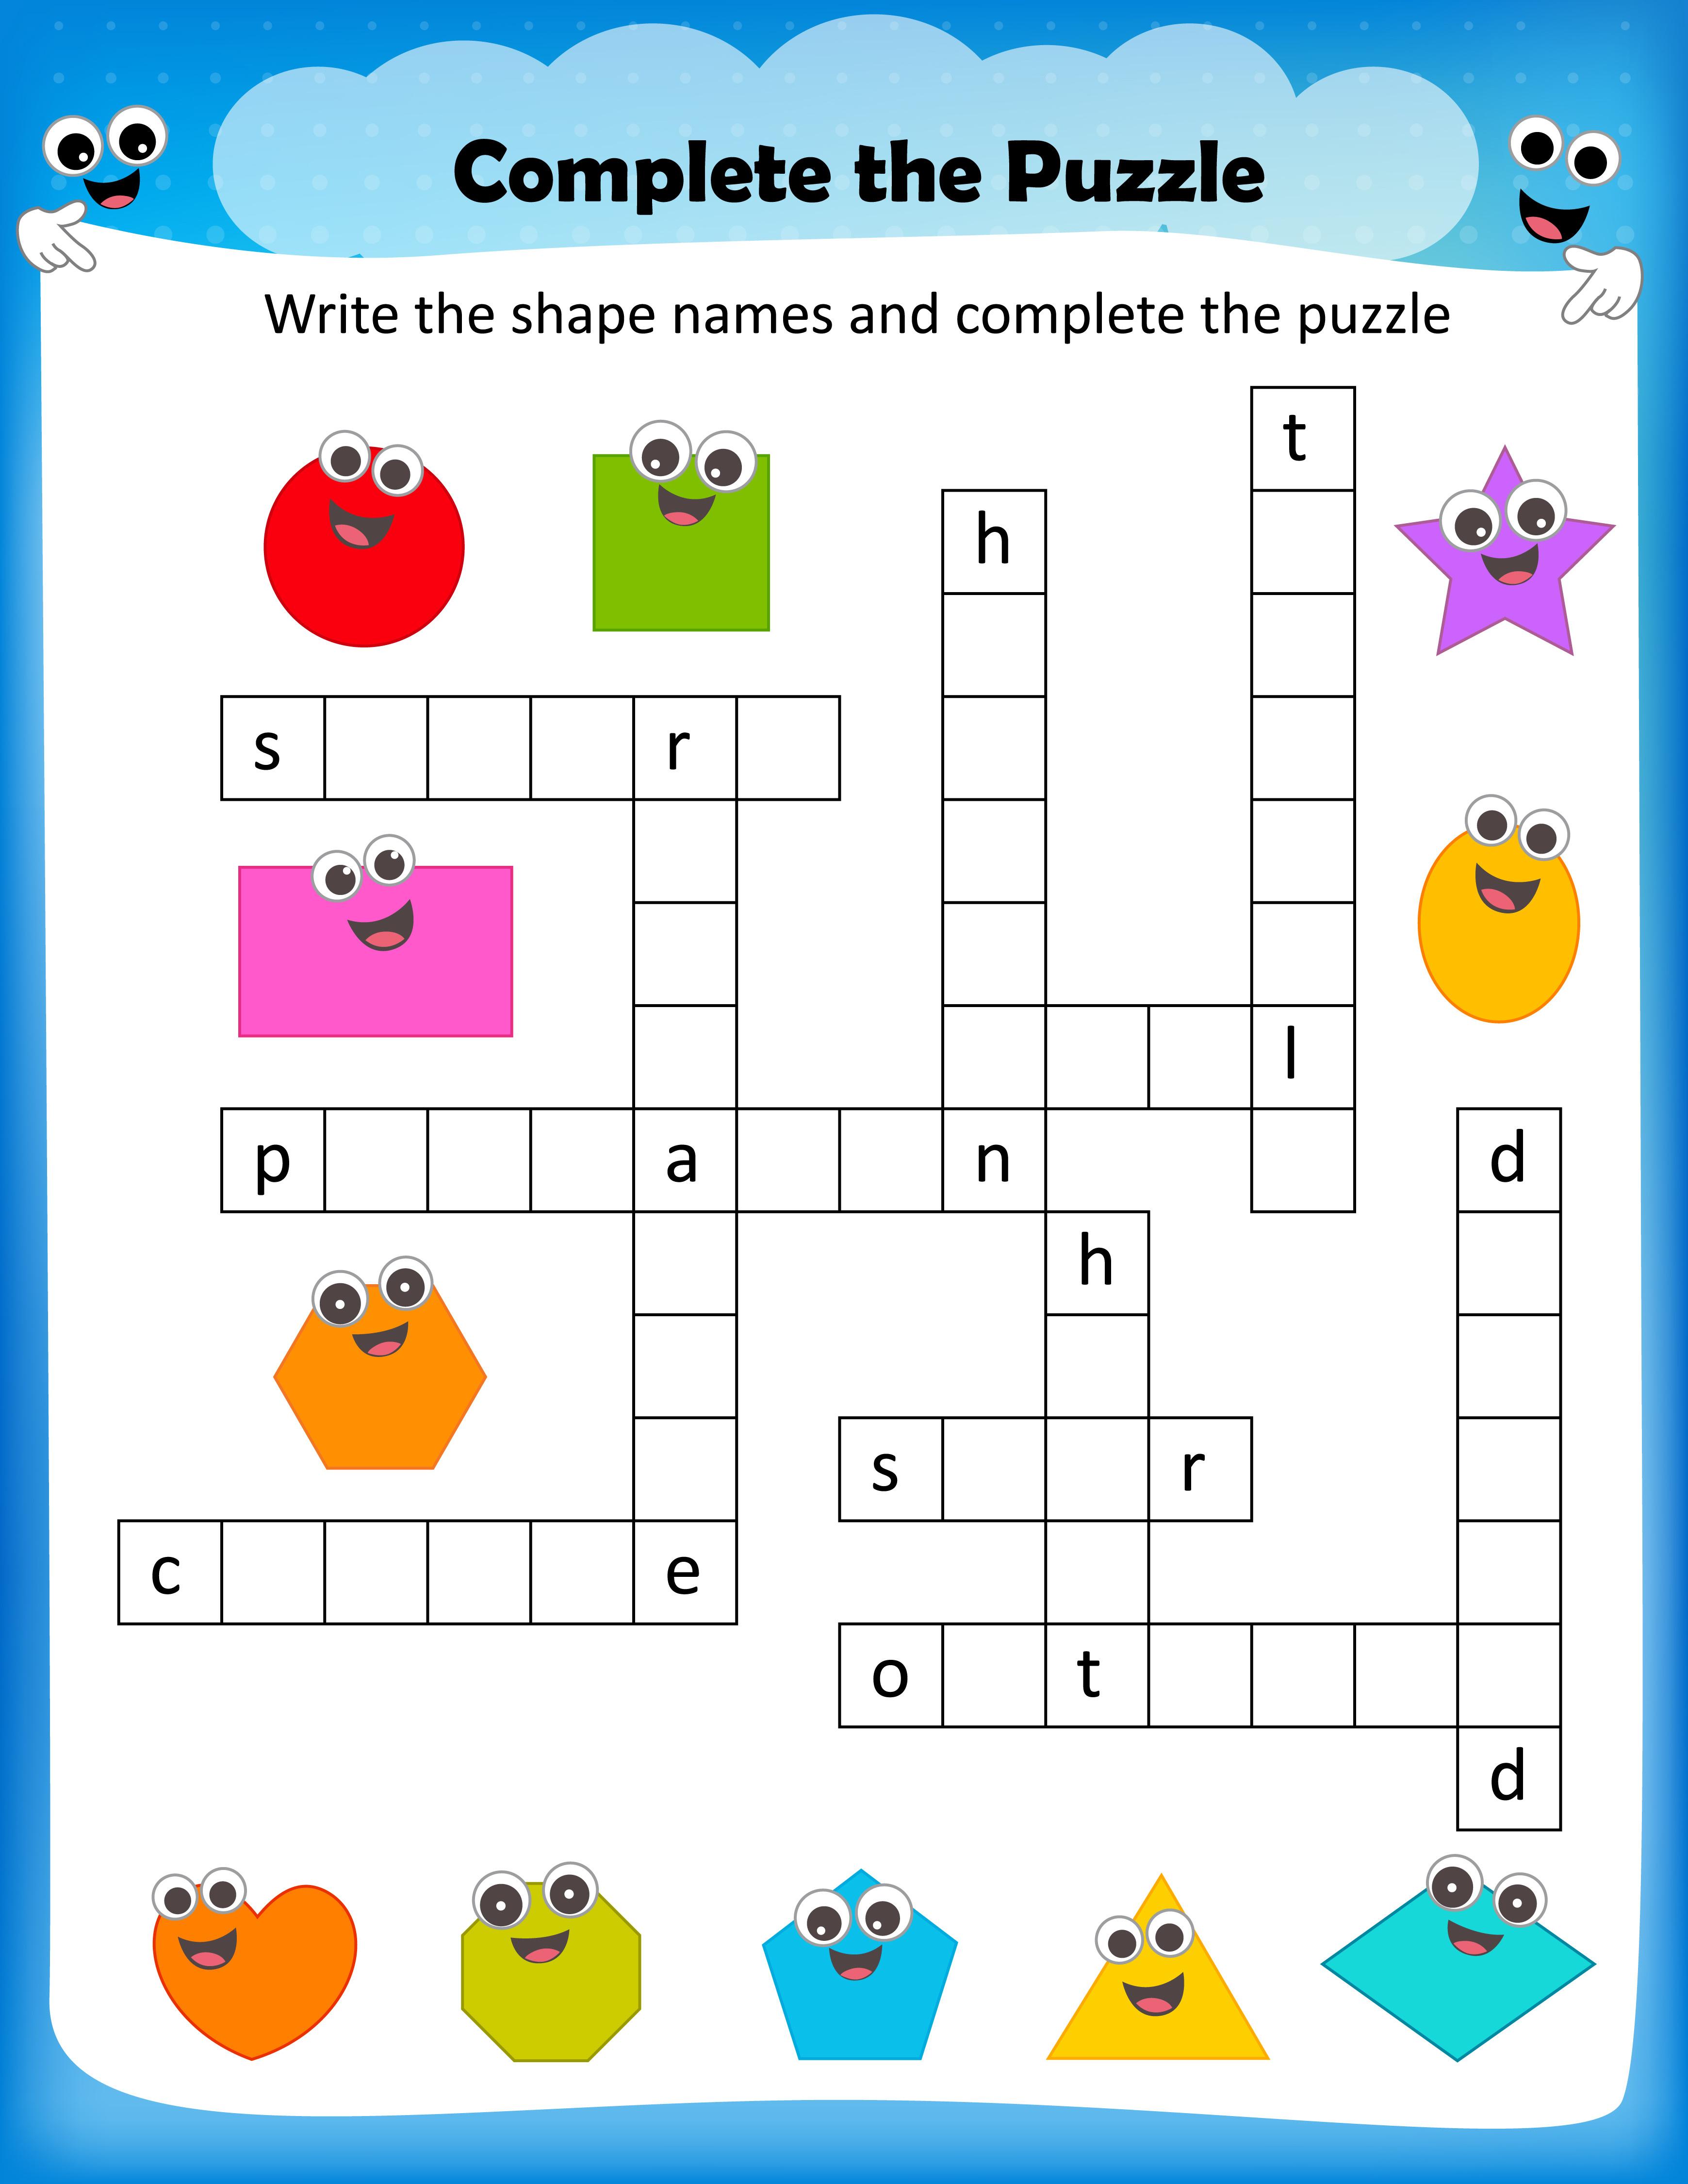 Free Printable Crosswords With Top 10 Benefits For Our Kids - Printable Crossword Puzzles For Preschoolers